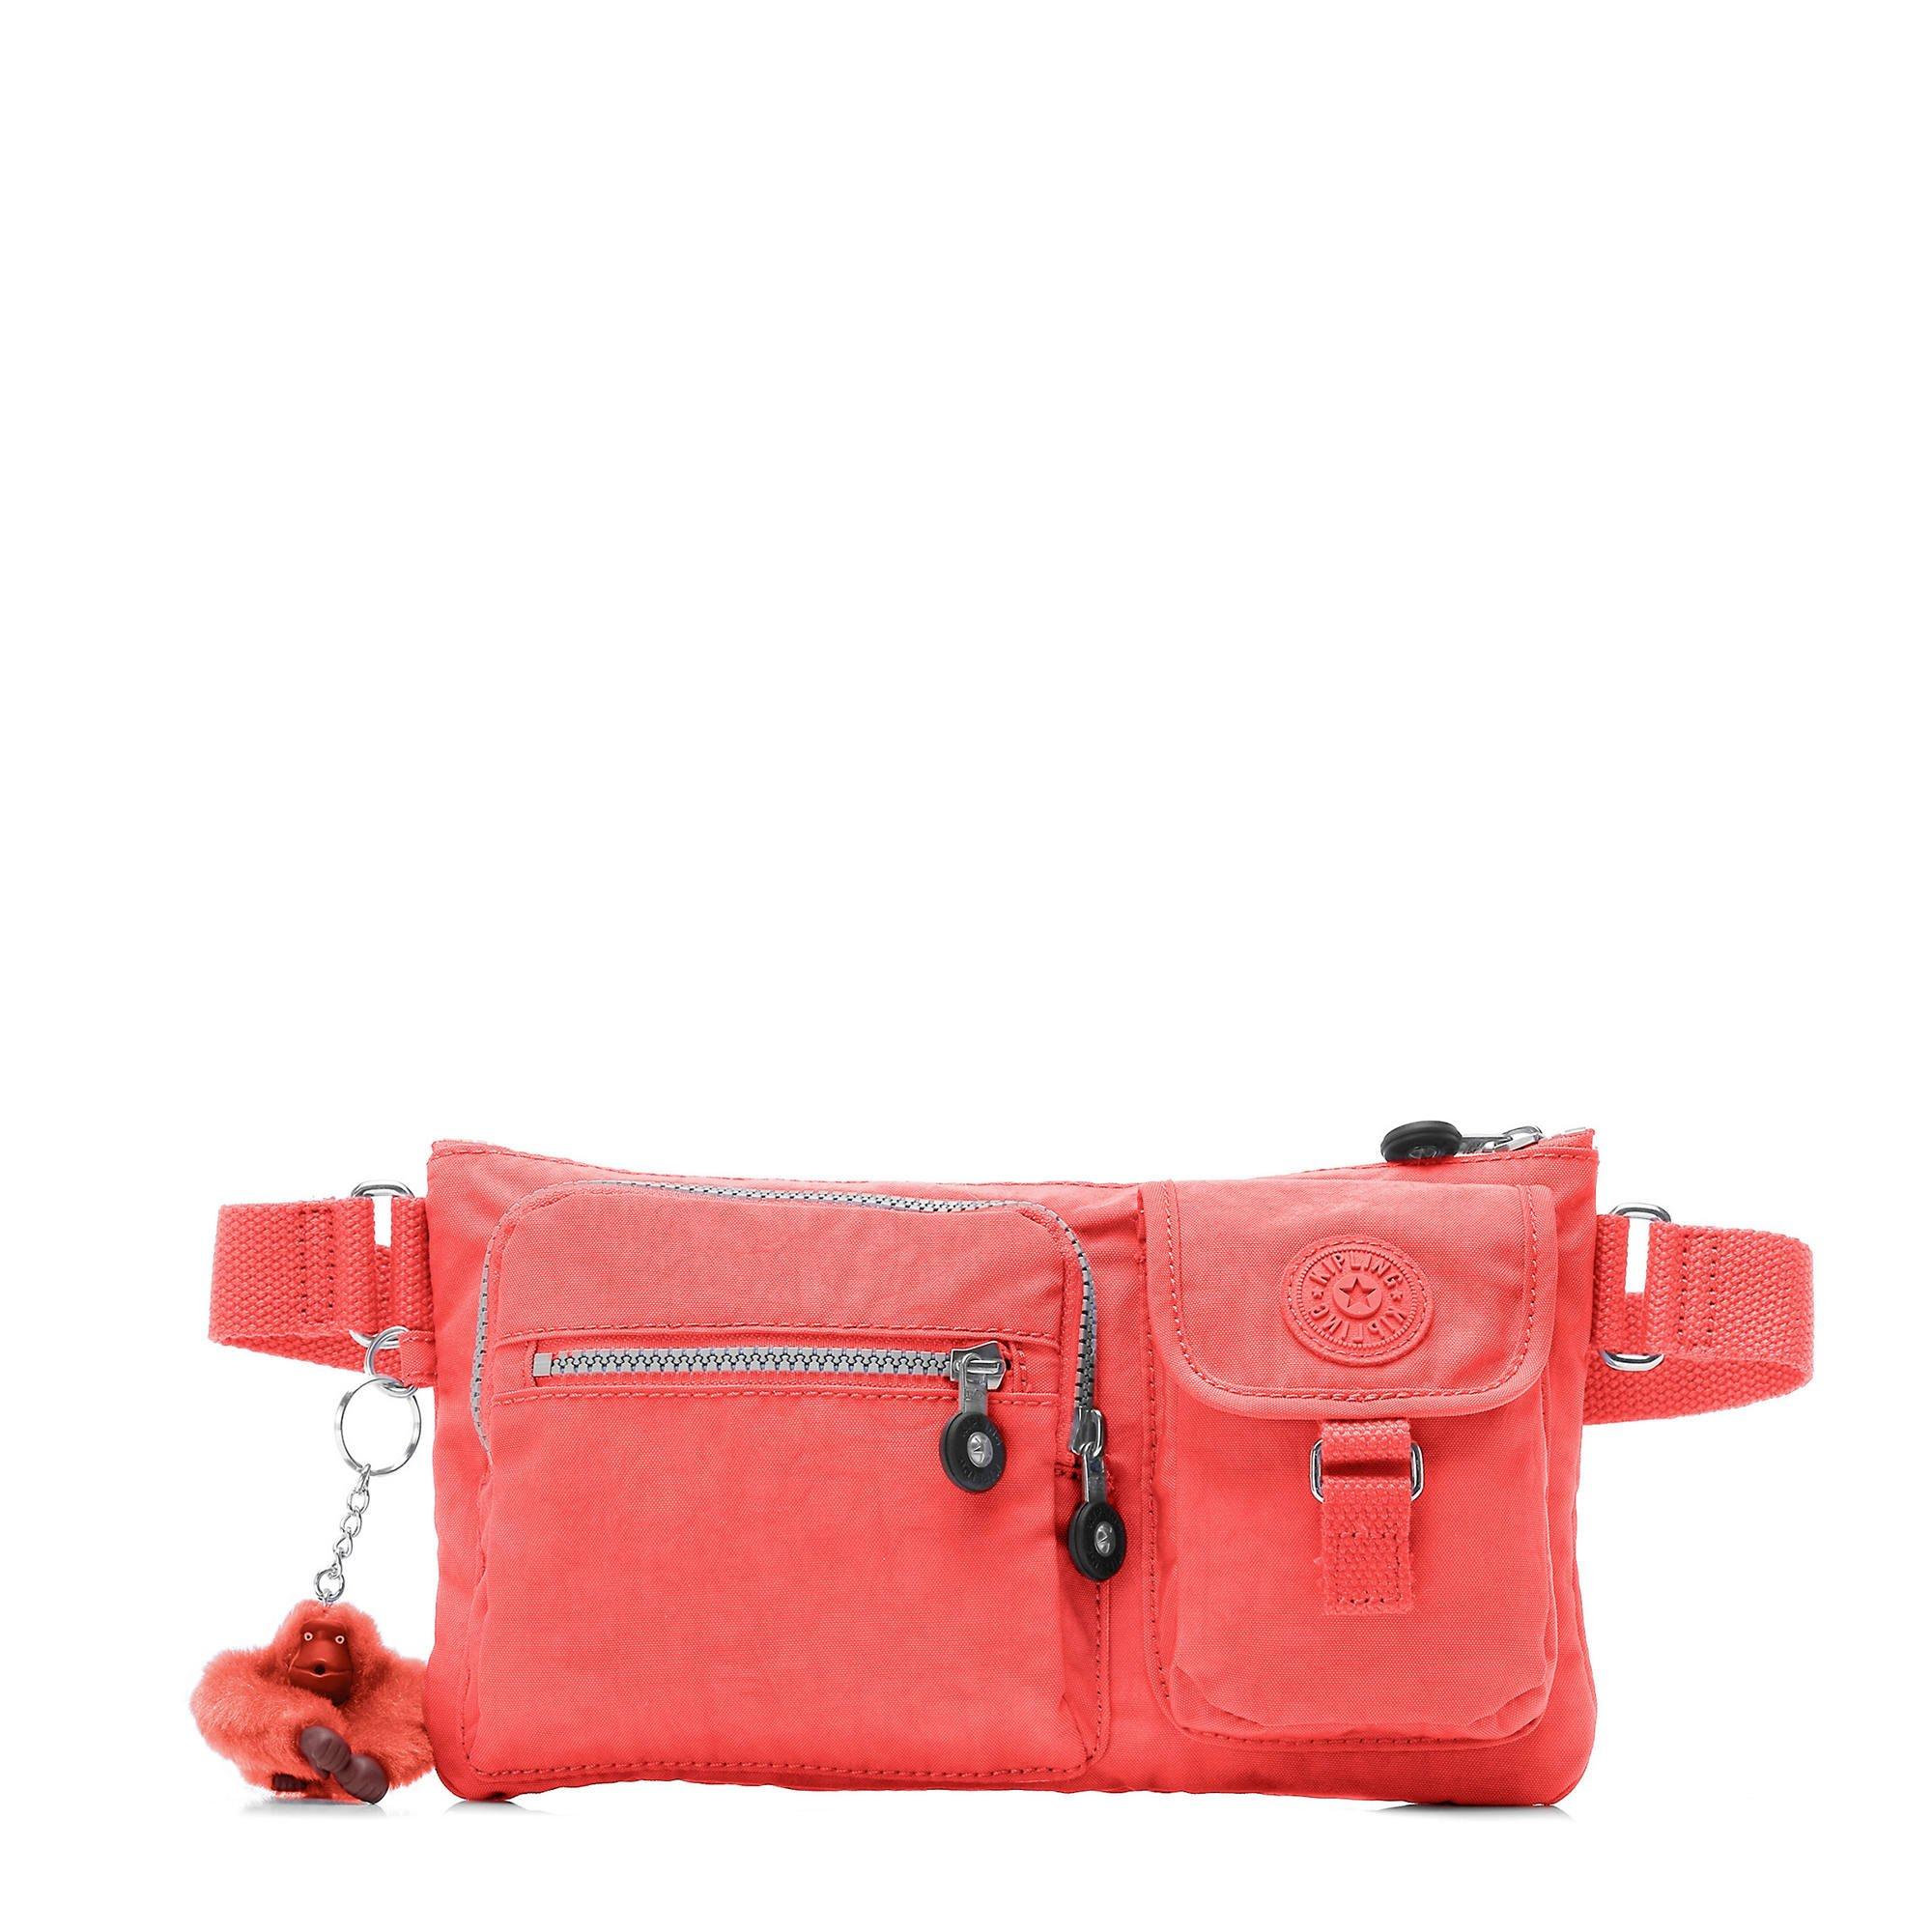 Kipling Women's Presto Solid Convertible Waistpack, Papaya